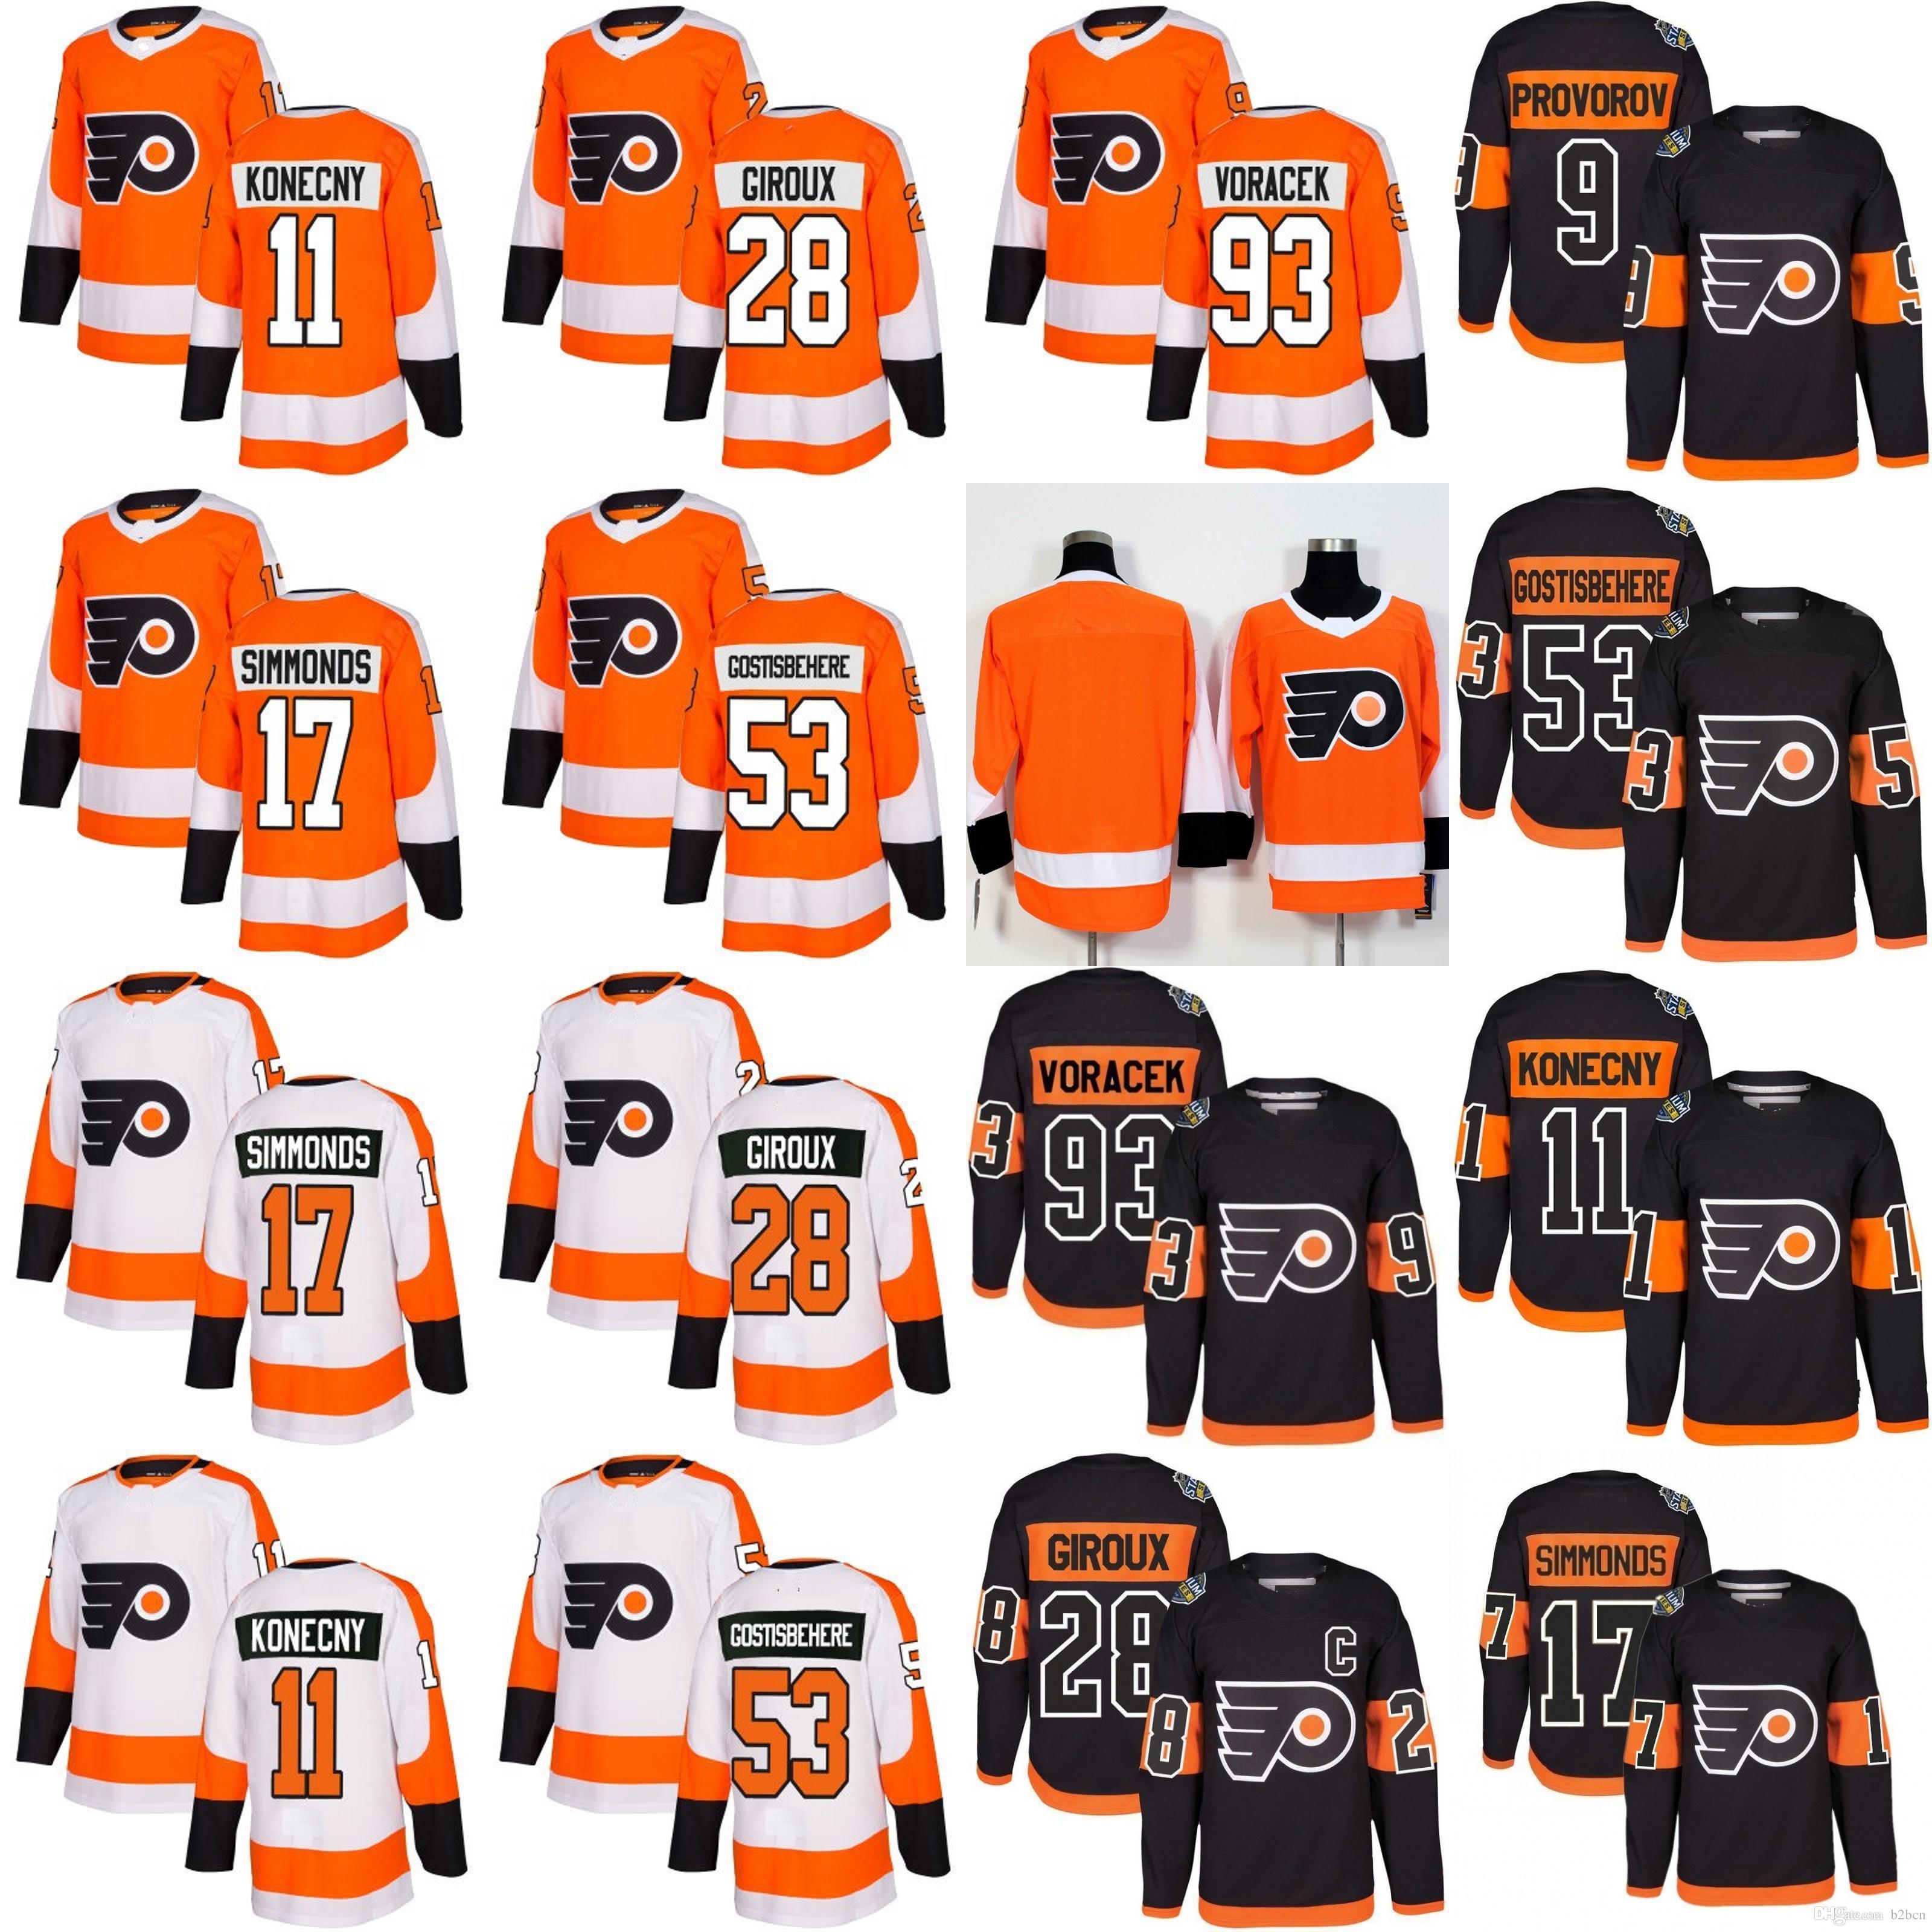 e22cb349c Philadelphia Flyers 53 Shayne Gostisbehere 17 Wayne Simmonds 28 Claude  Giroux Jakub Voracek Ivan Provorov Konecny Eric Lindros Hockey Jersey  Shayne ...